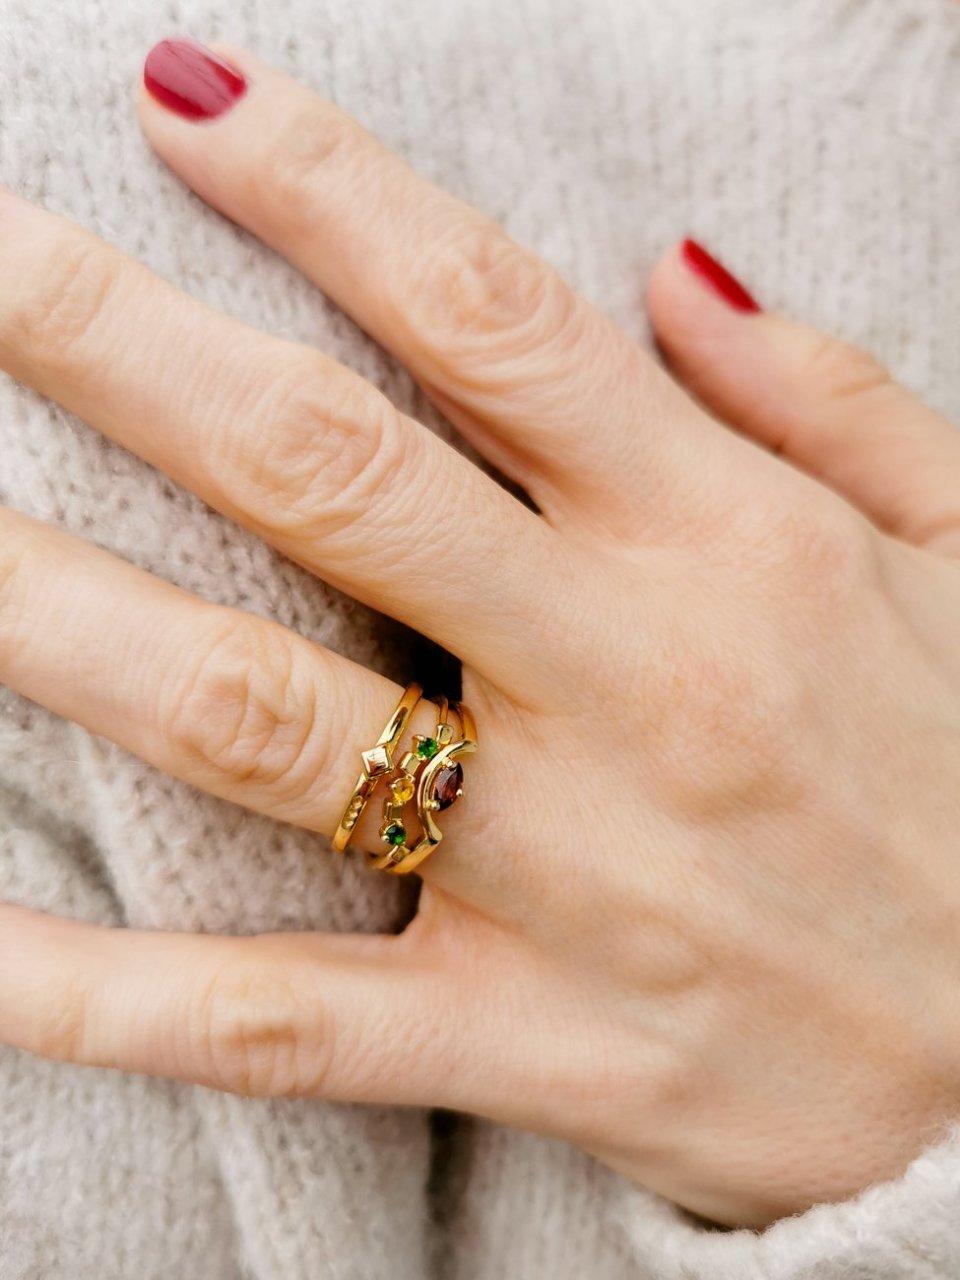 conny doll lifestyle: Carolin Stone, Daring Triad Ring, Edelsteinschmuck, Verlosung